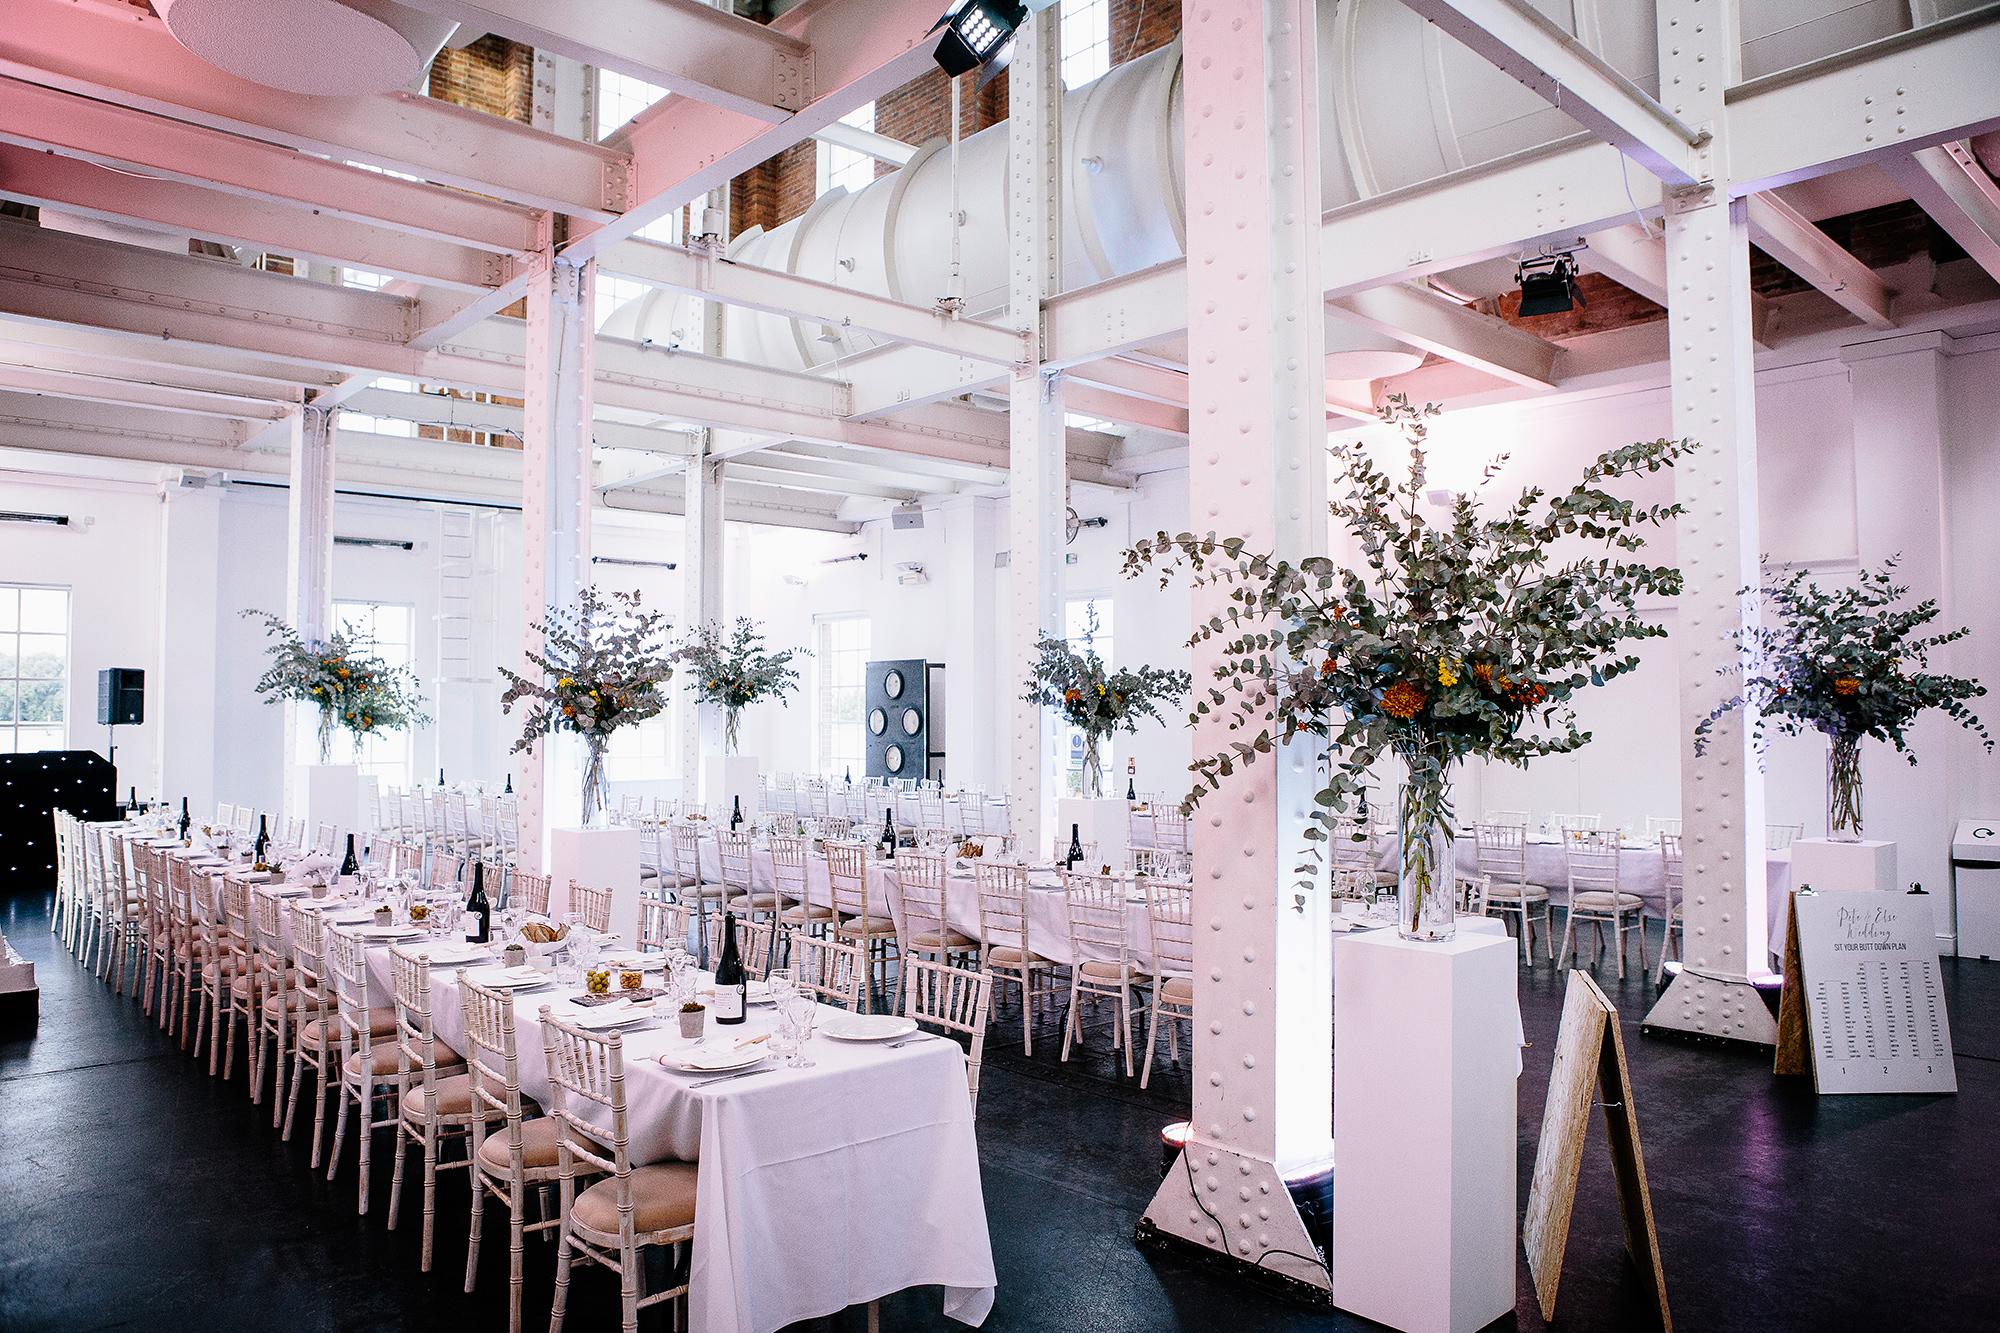 Wedding Reception at West Reservoir Centre, London